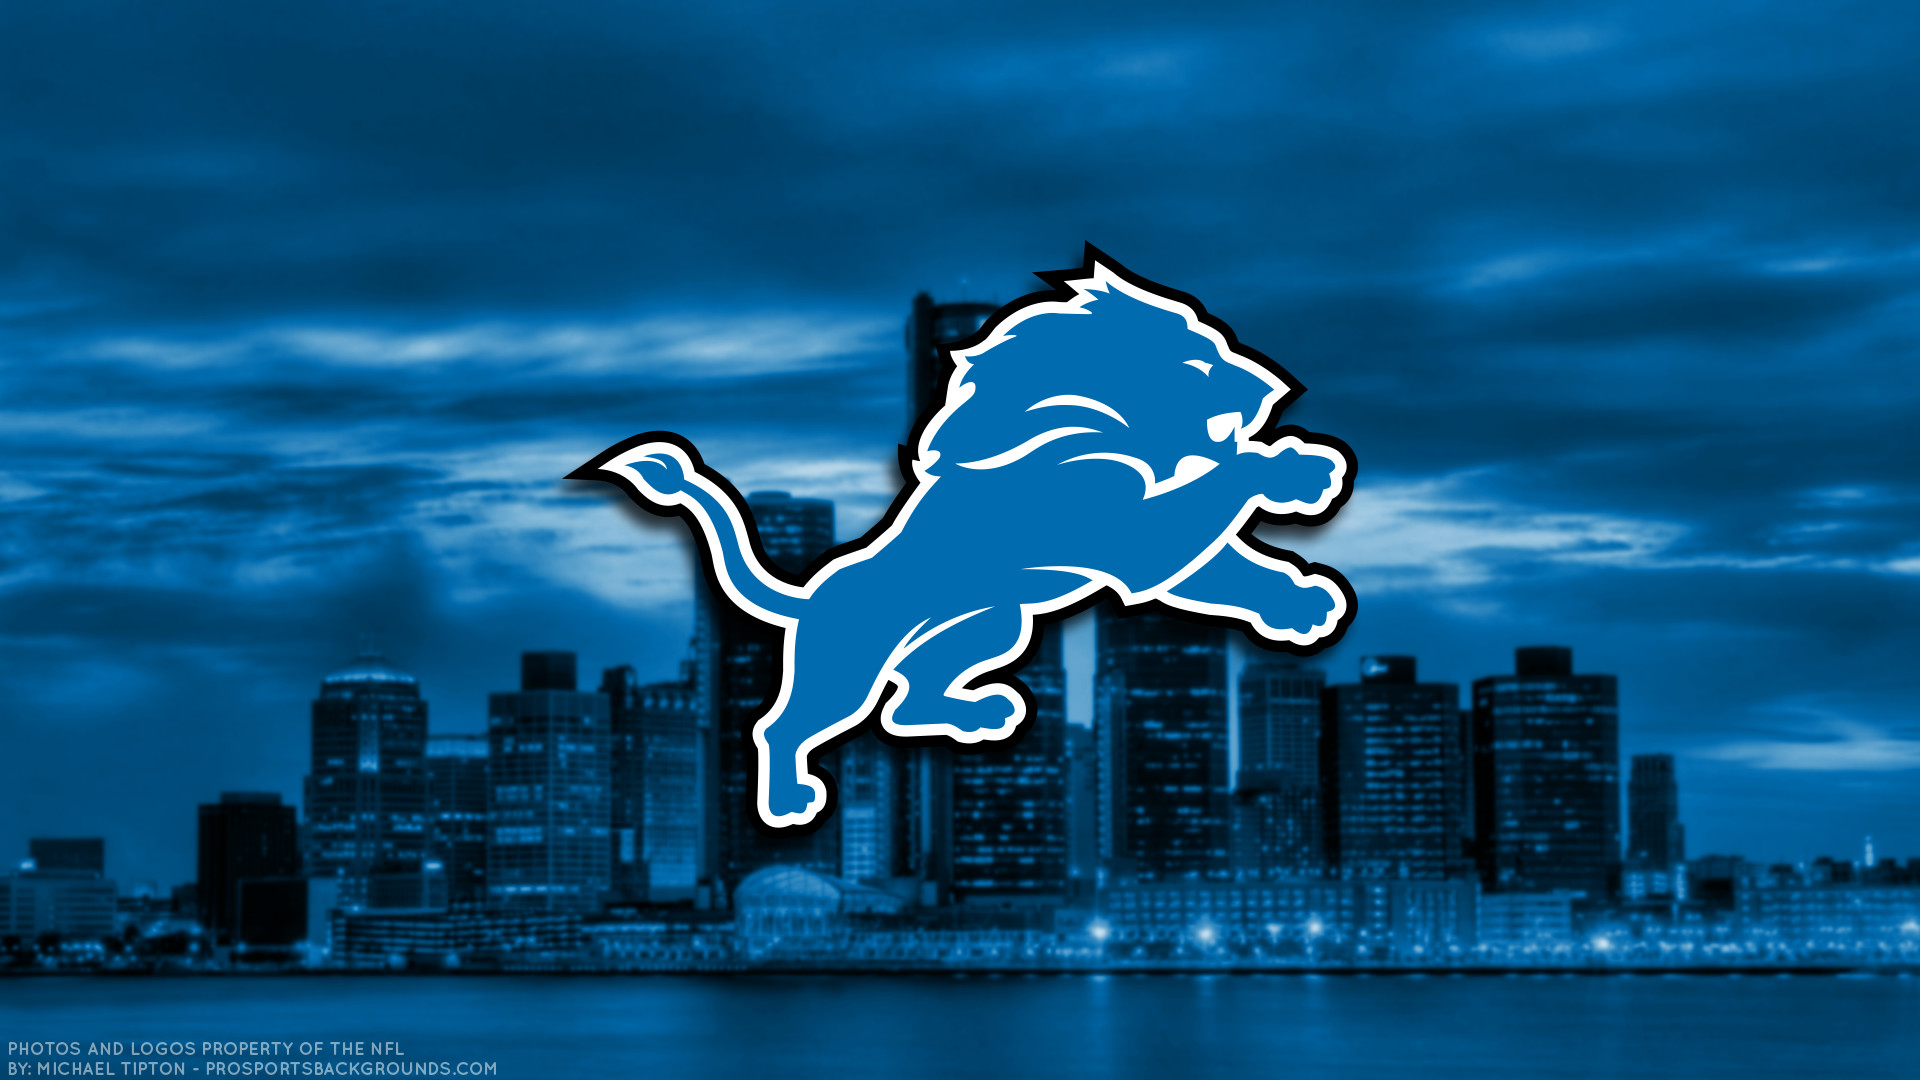 … Detroit Lions 2017 football logo wallpaper pc desktop computer